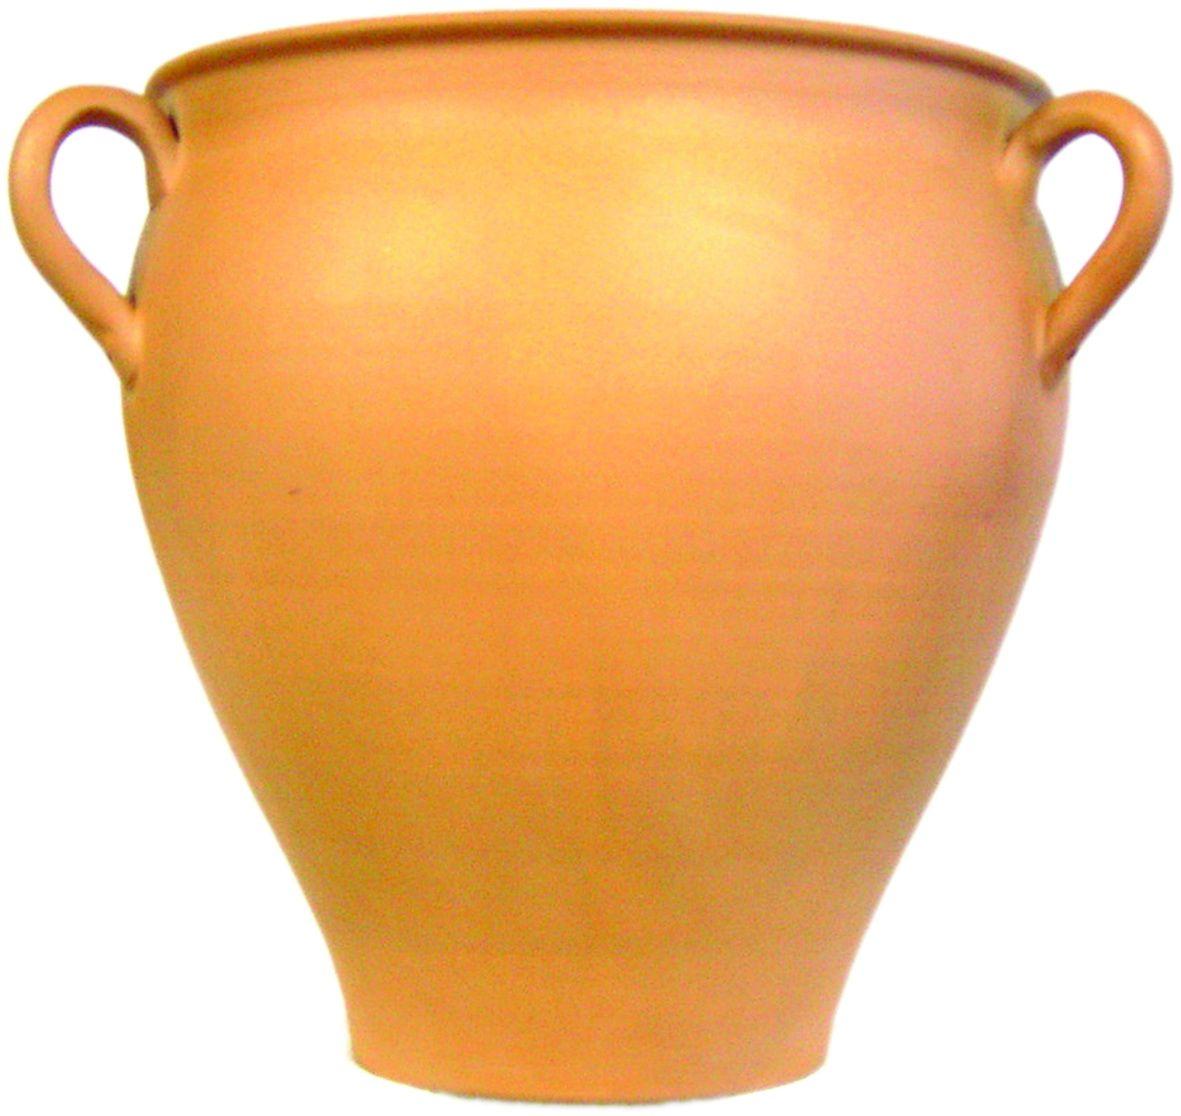 "Tarusa artist / Pot with handles ""Korchaga"", 15L"